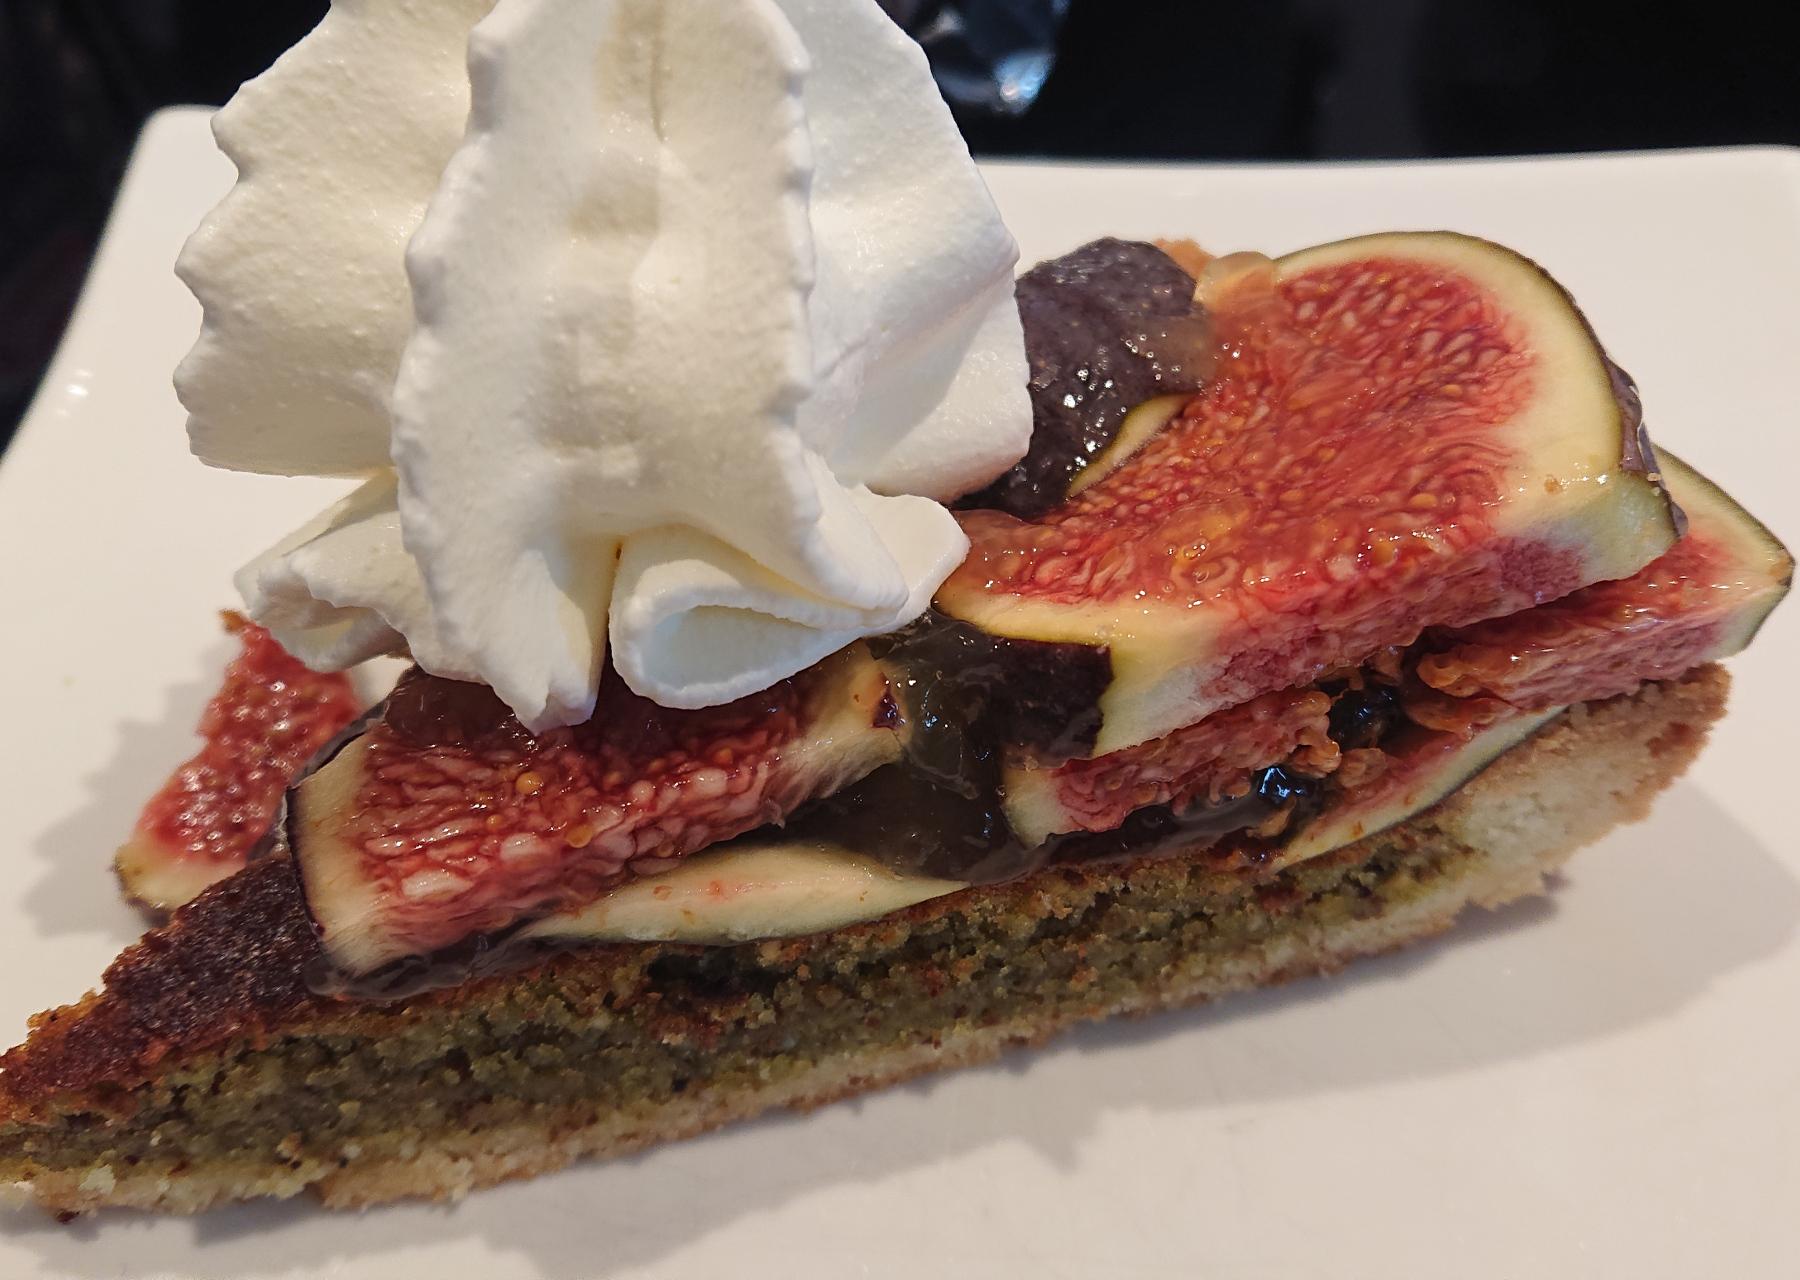 Feigen-Pistazien Kuchen